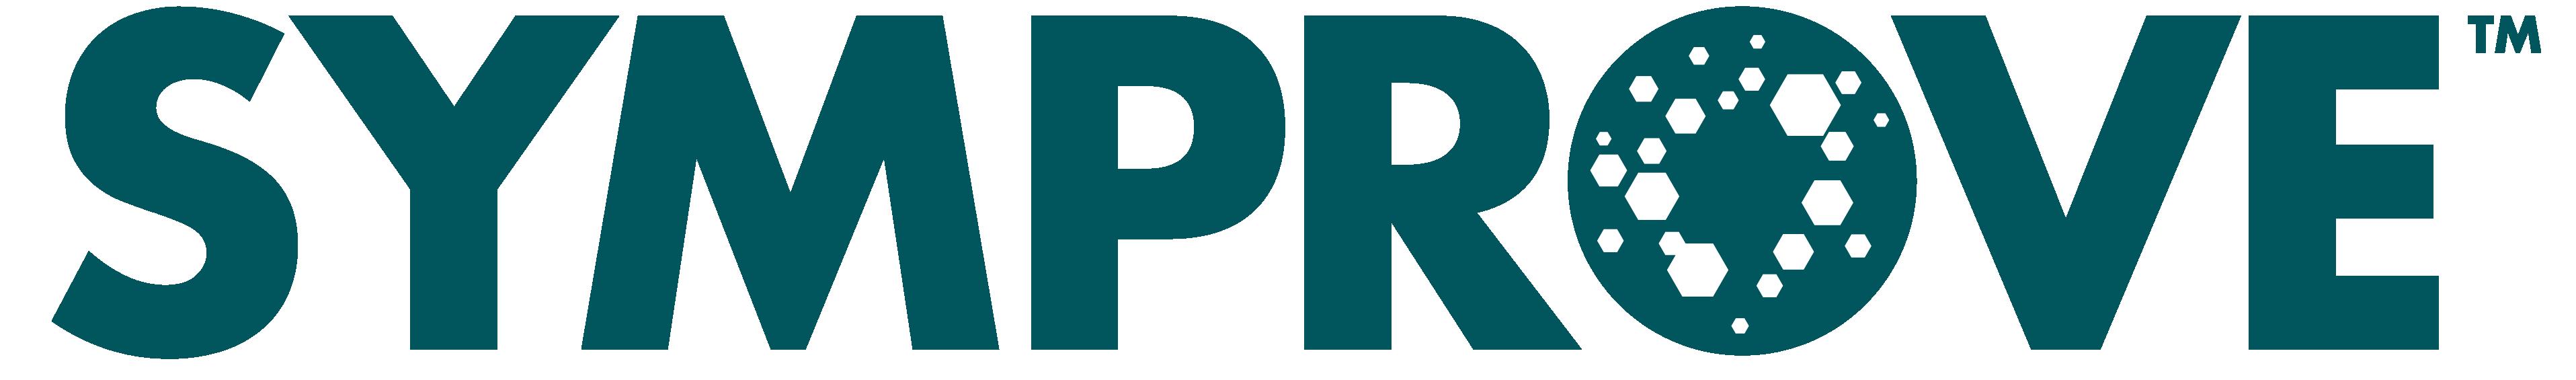 Symprove_Logo_BioTech_Pharma_Summit